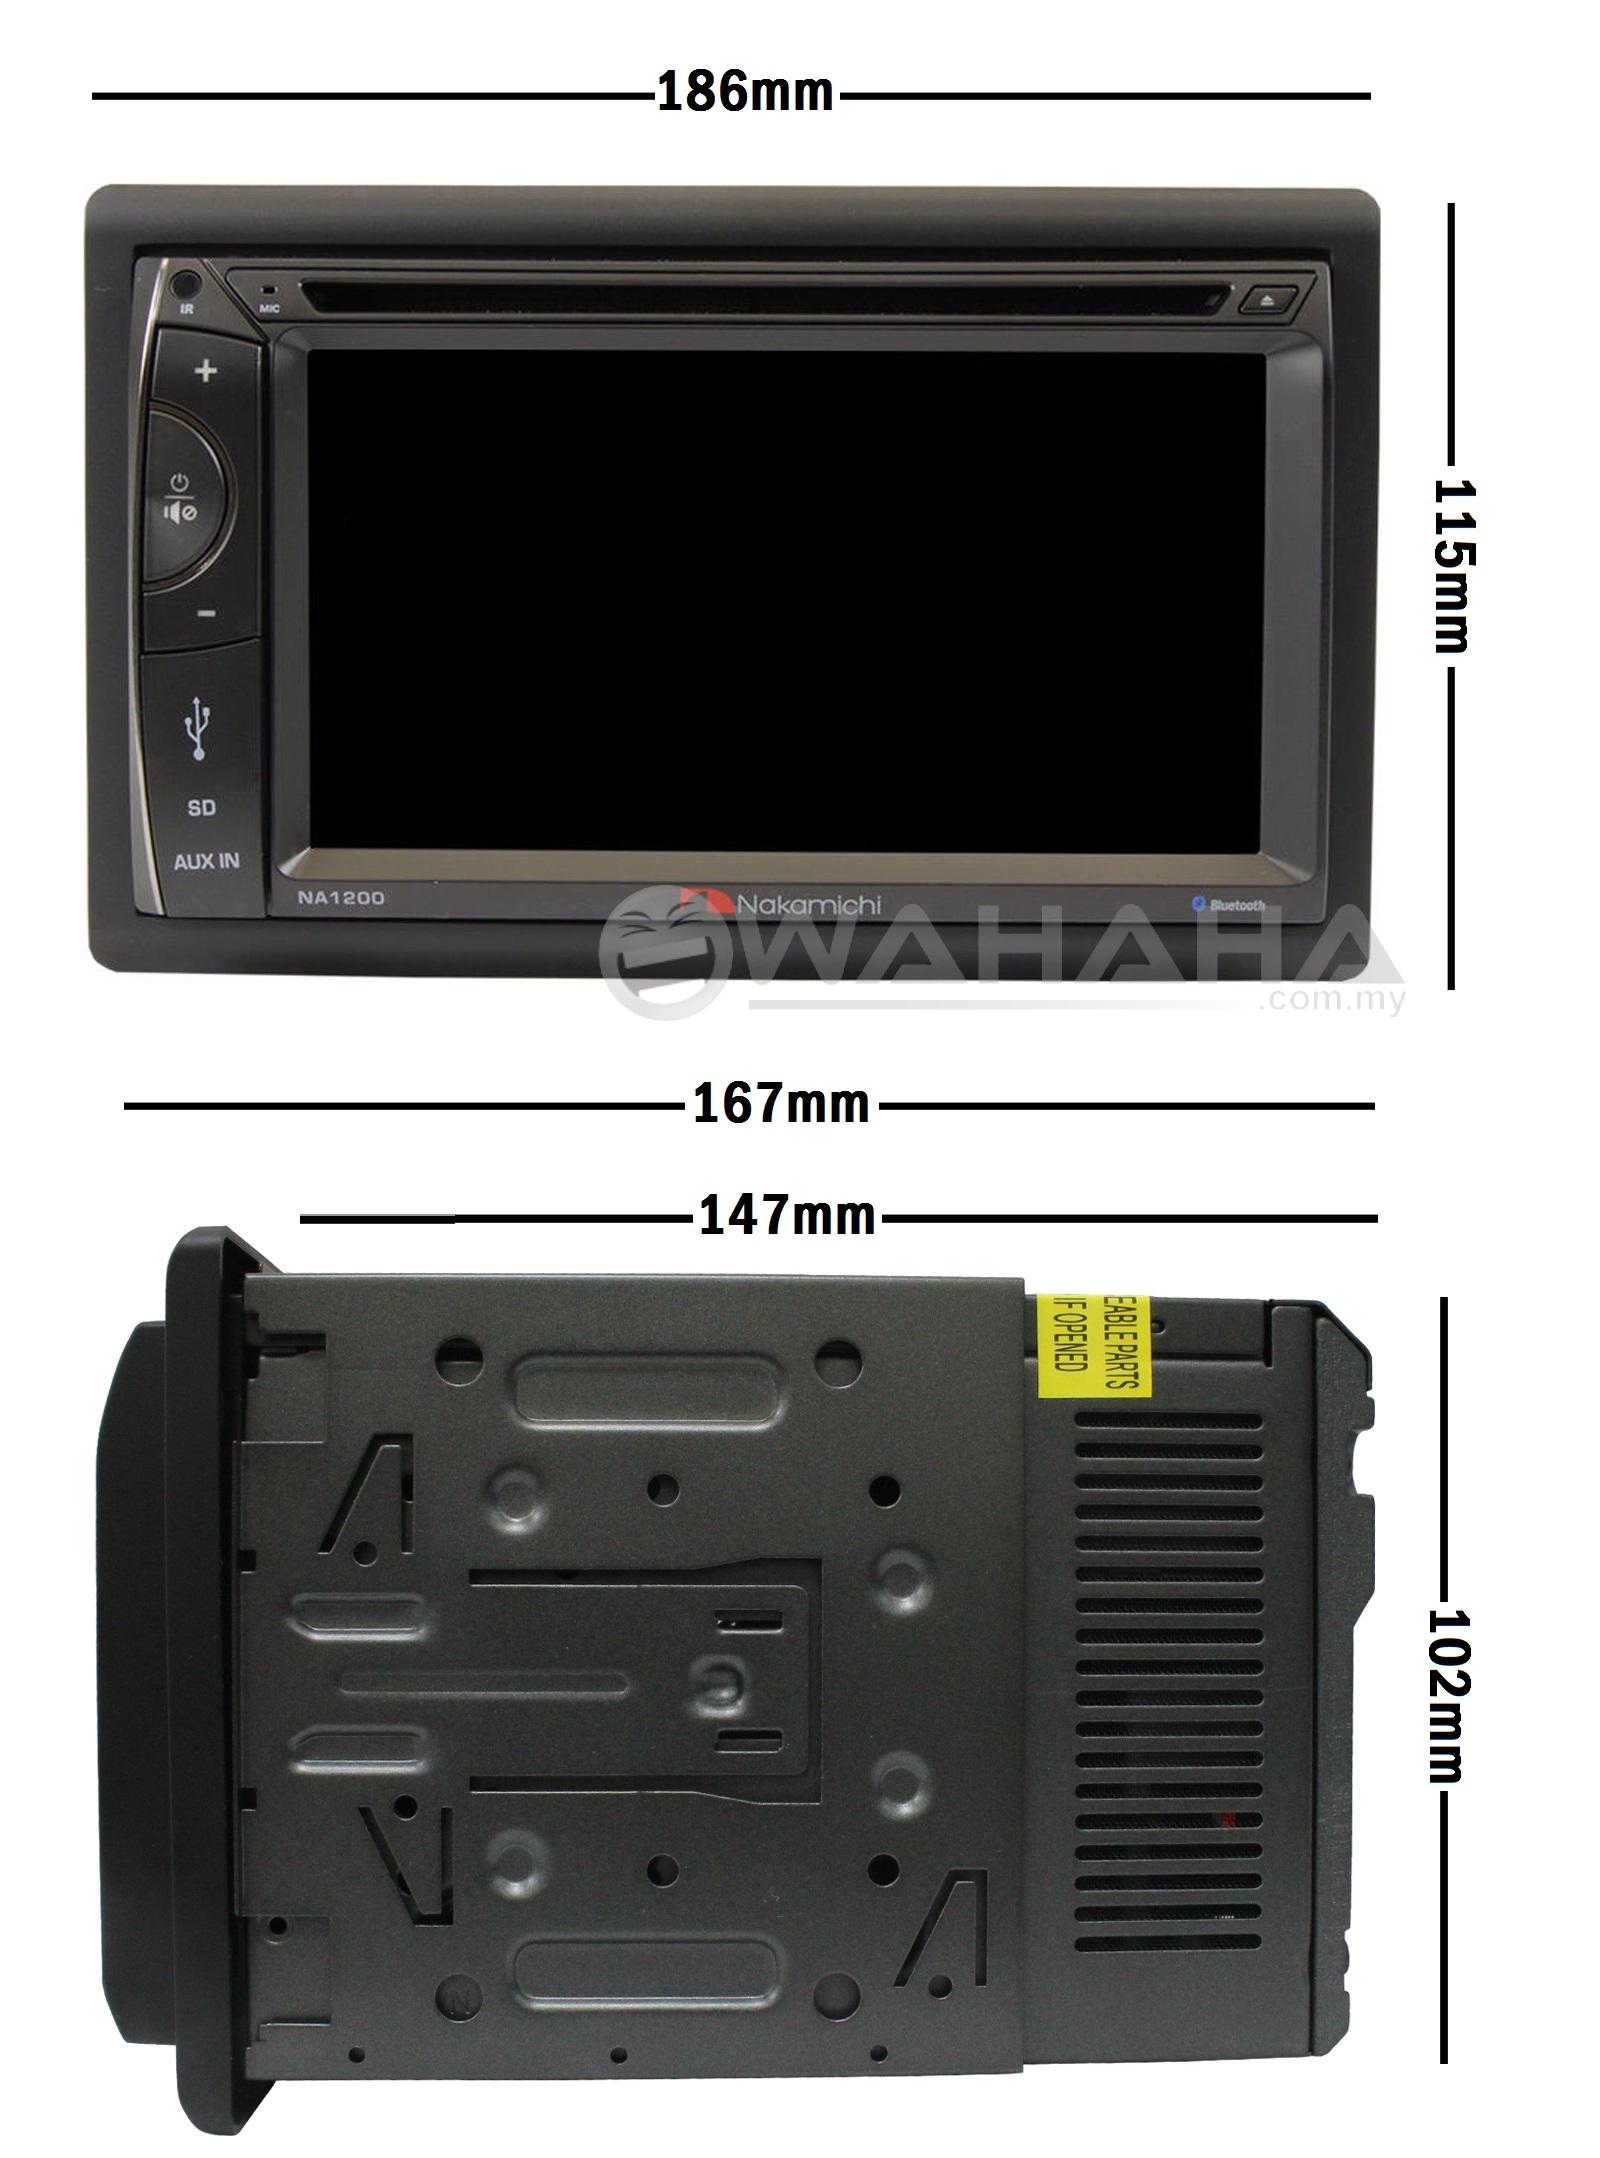 nakamichi na1200 6 2 hd screen 2 double din car dvd bluetooth player